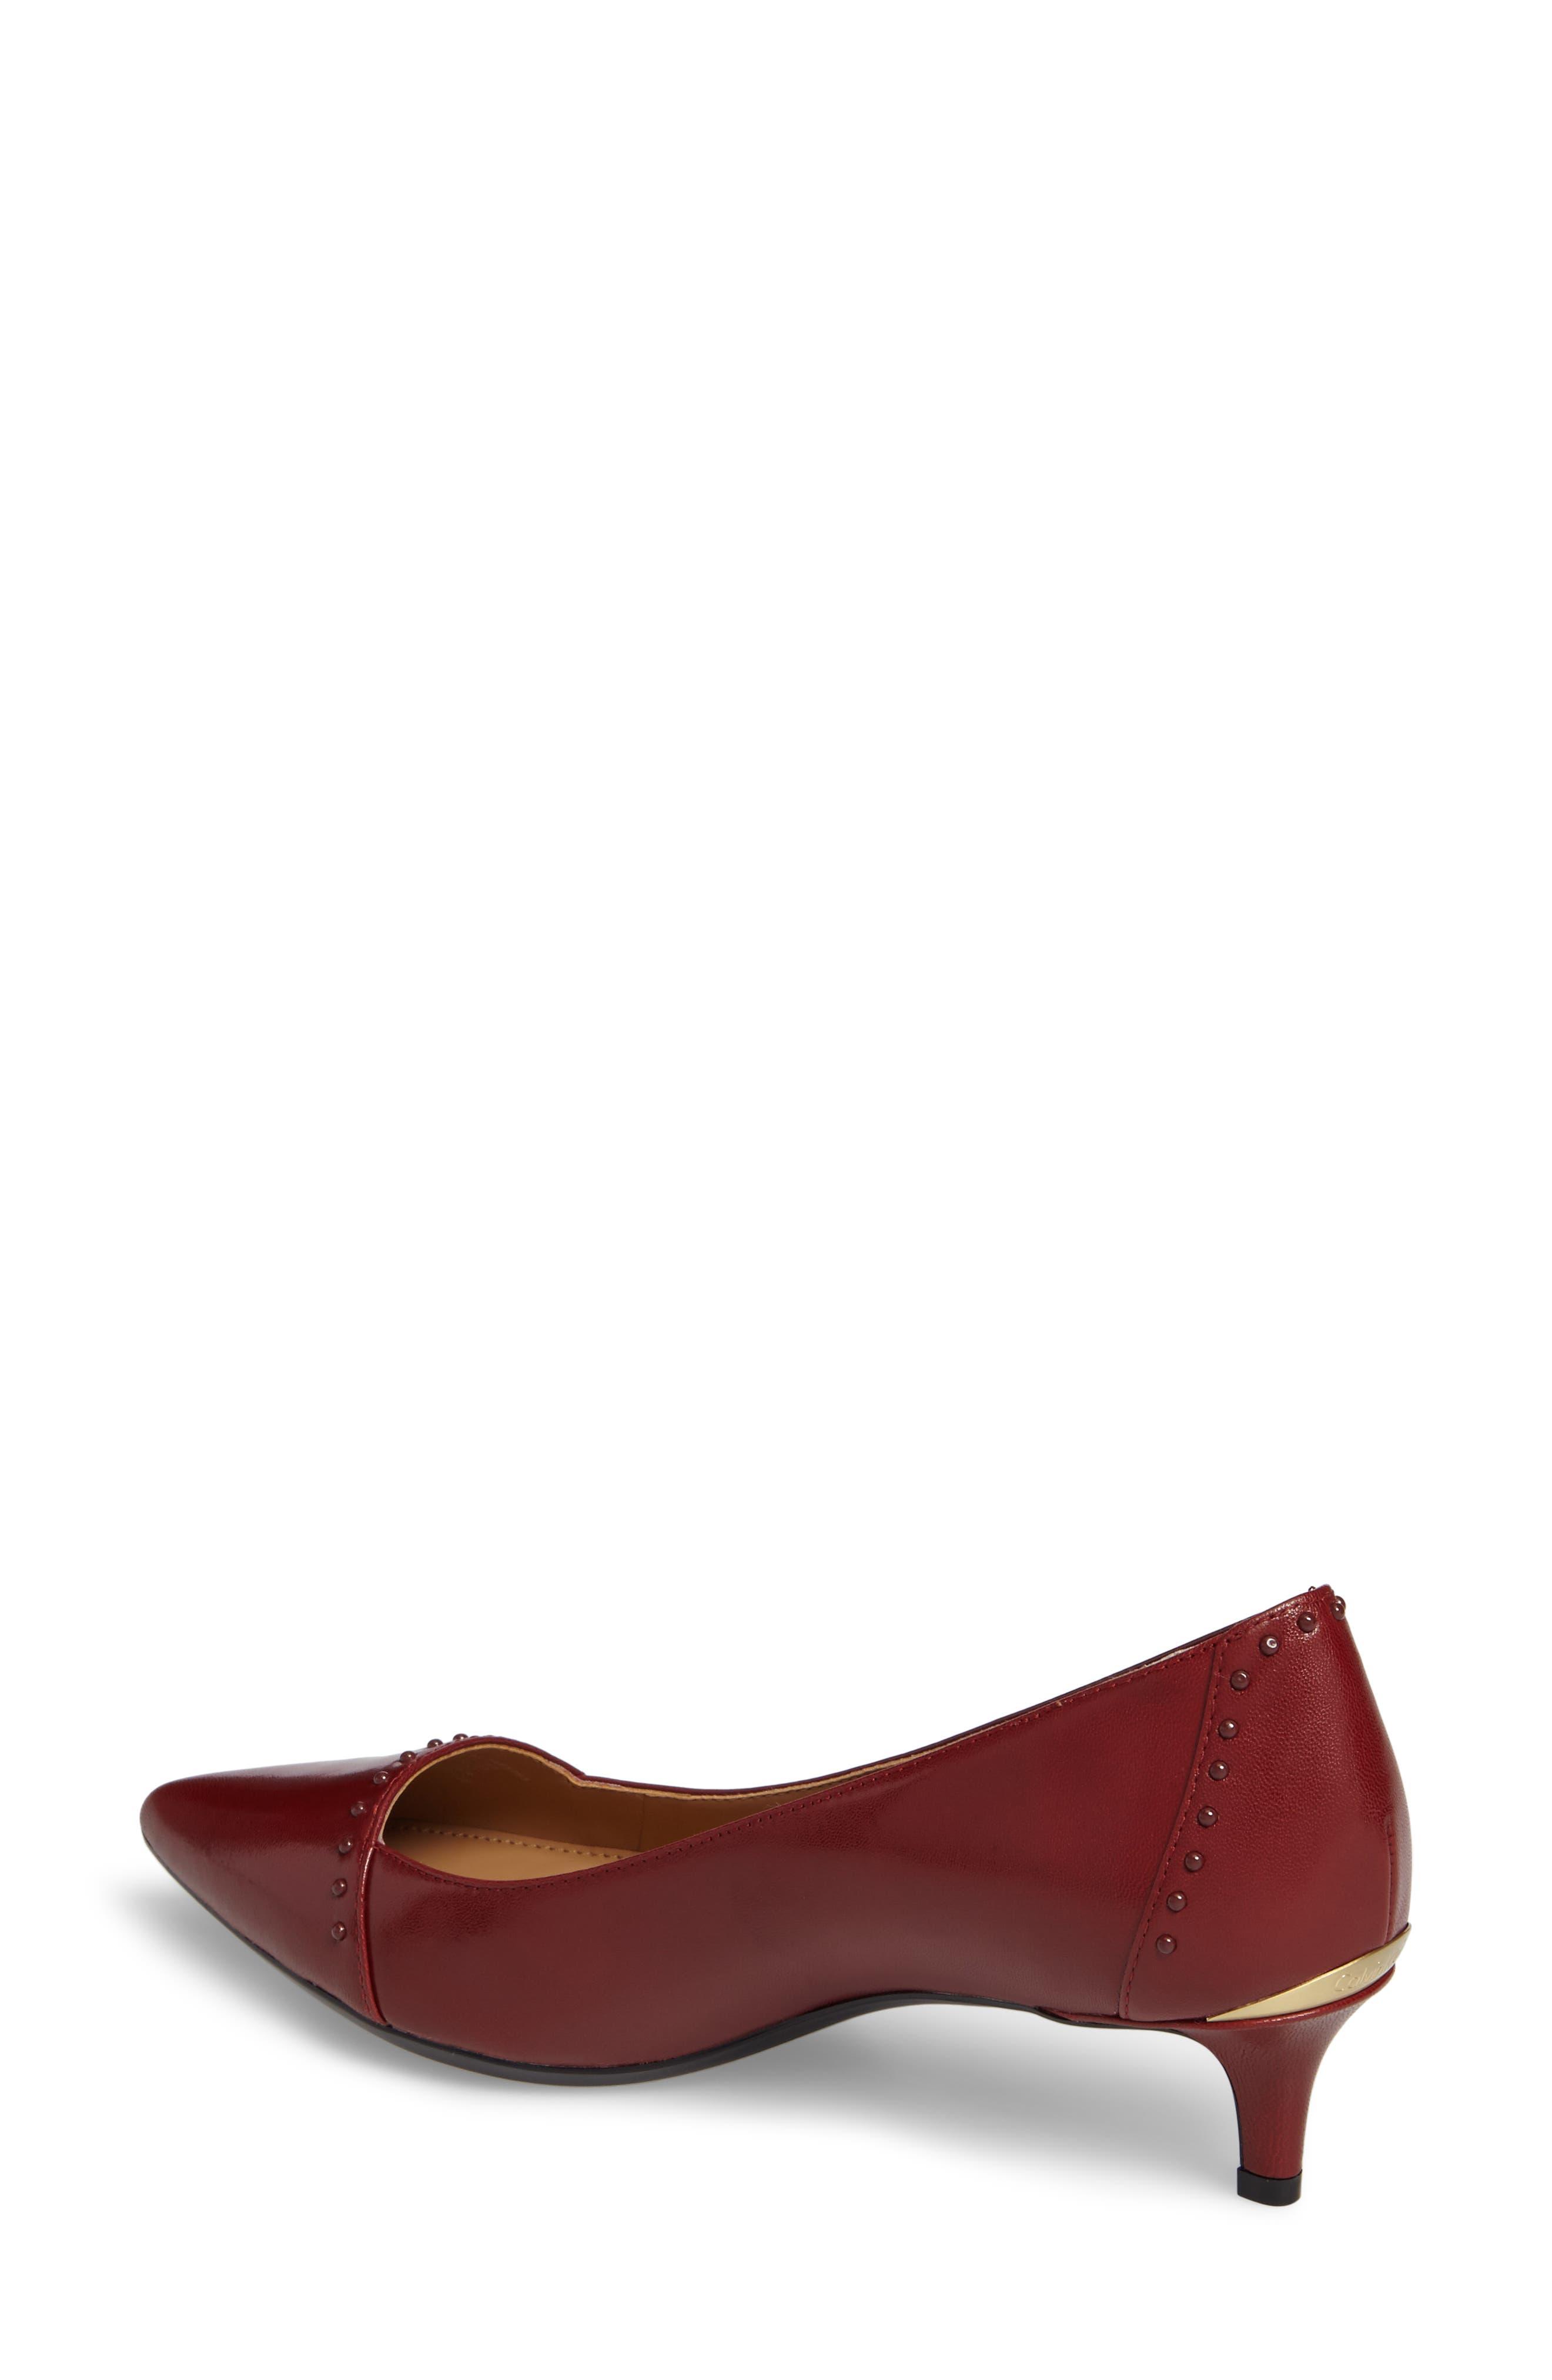 Griselda Studded Cap Toe Pump,                             Alternate thumbnail 2, color,                             Cherry Red